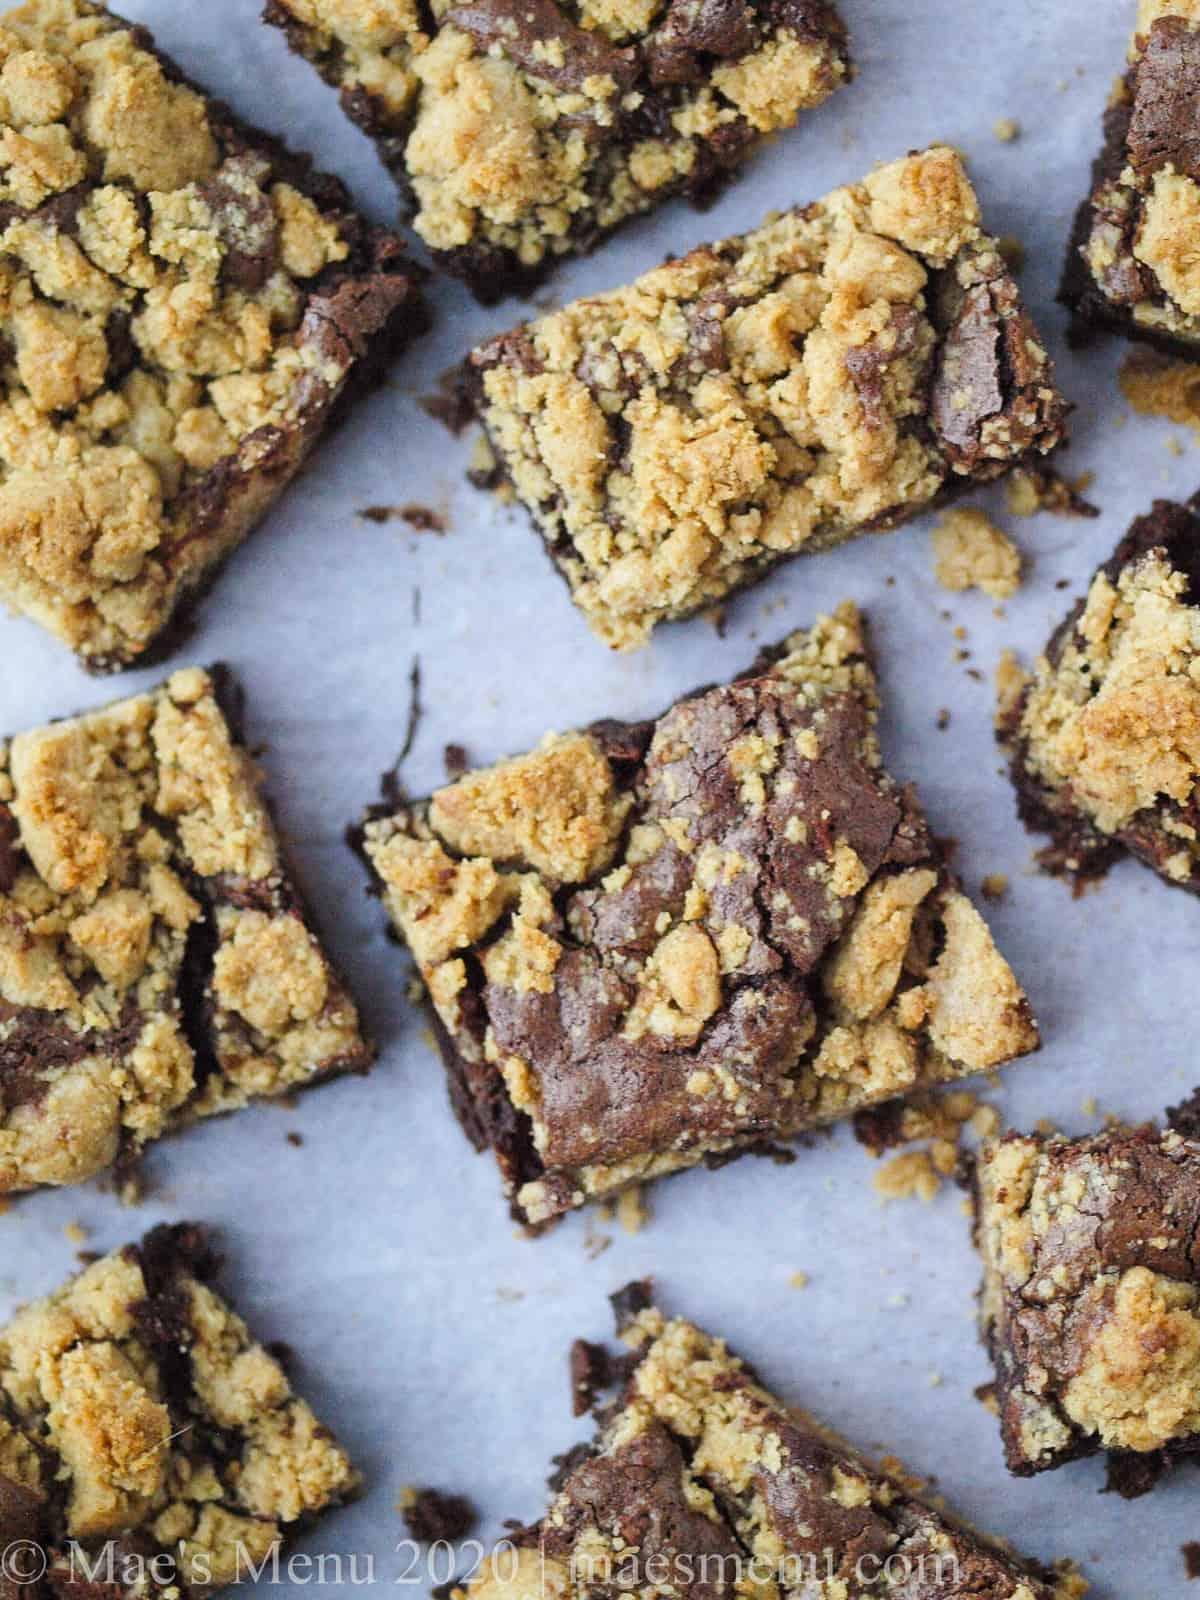 A sheet of Peanut Butter Brookies (Peanut Butter Brownie Cookies)